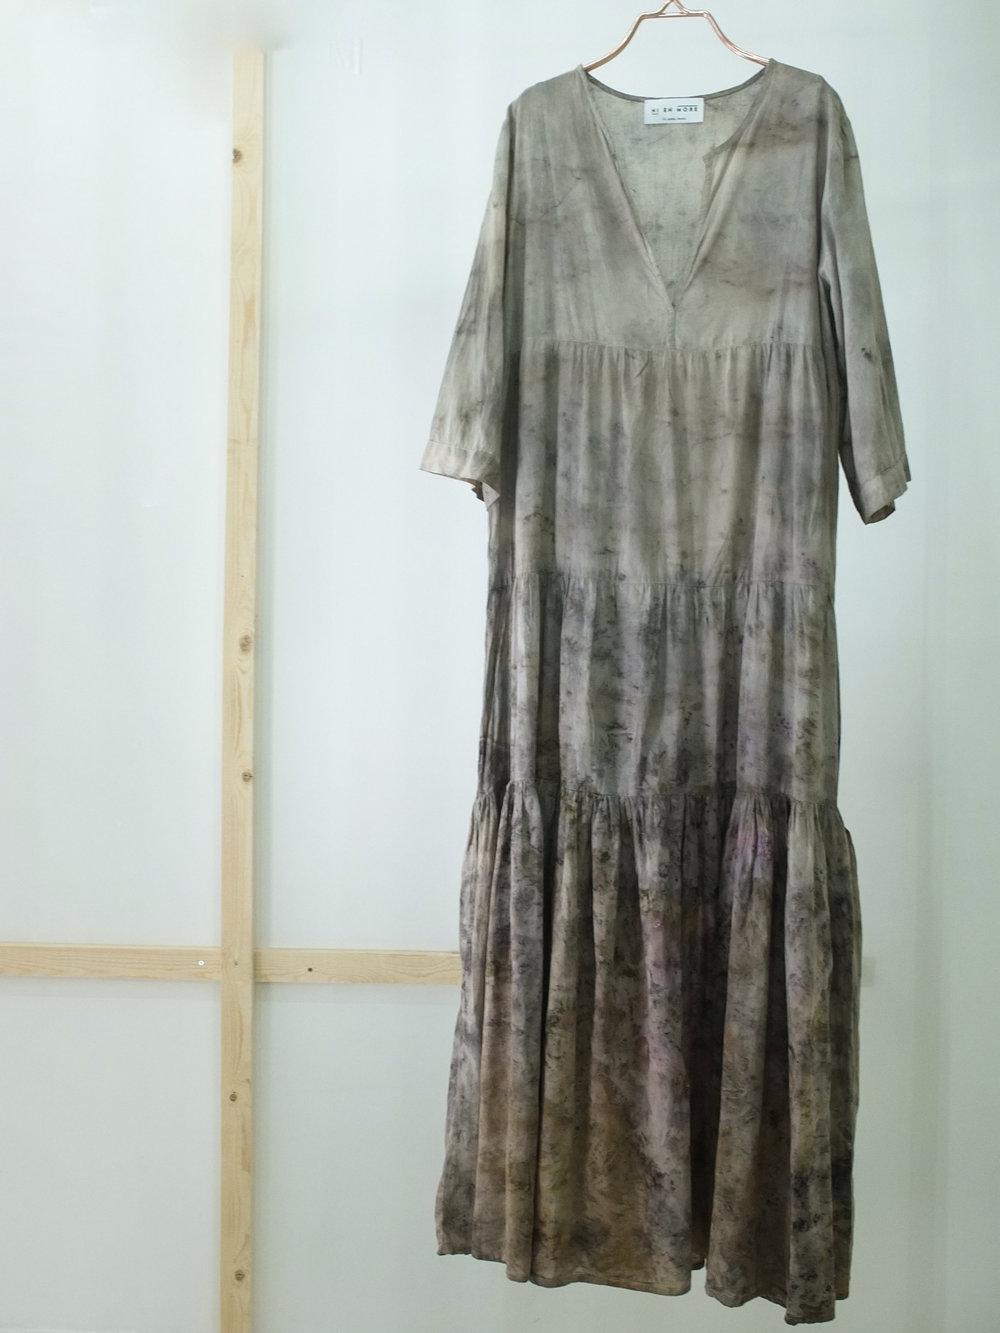 COTTON DRESS · No. 9 OF 60 · SIZE LARGE